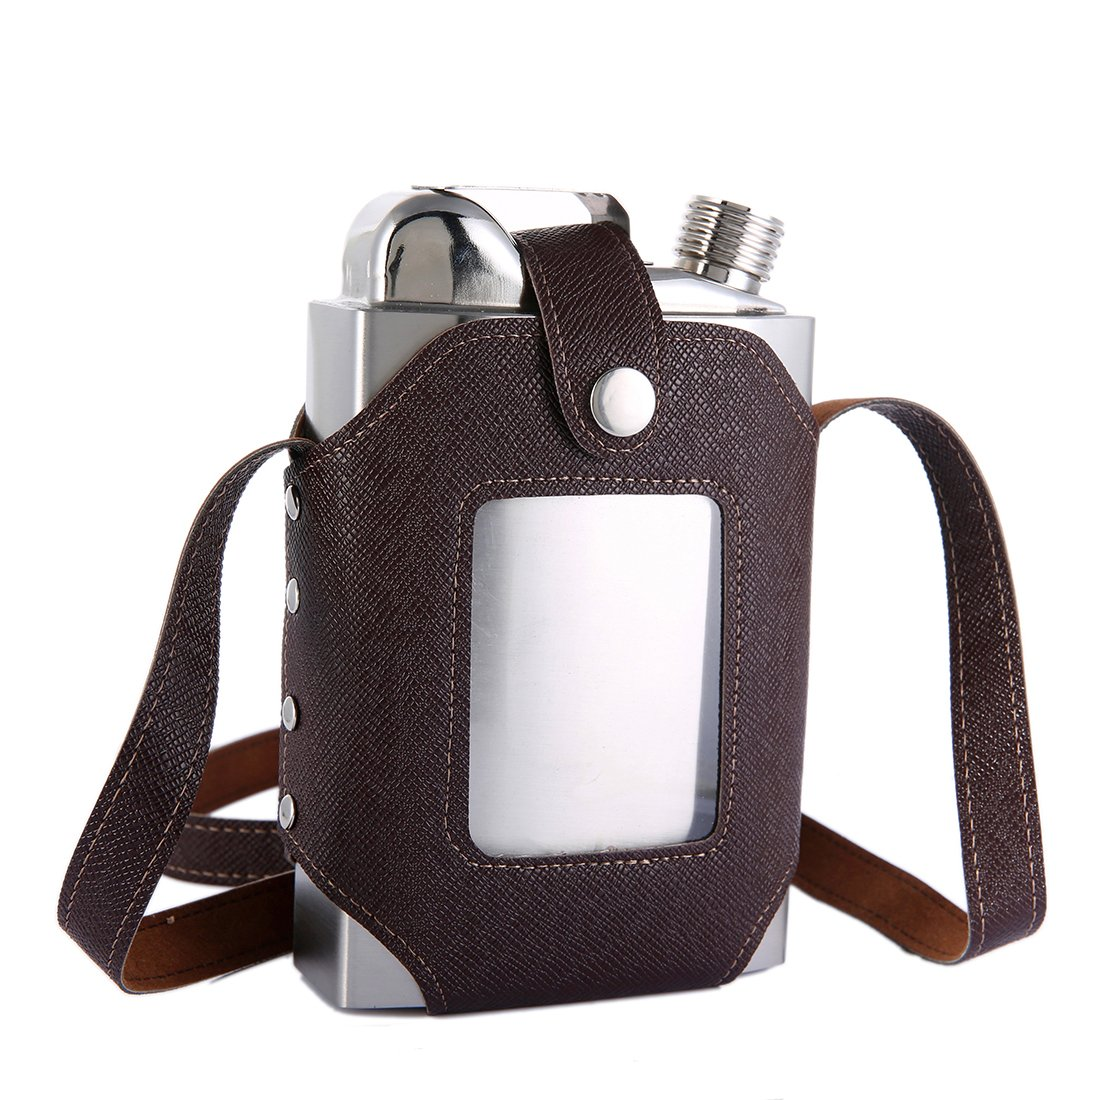 【超特価SALE開催!】 (0002 Big 26 oz) - Taneaxon (0002 Large 770ml Capacity Big Stainless Steel Flask with Removable Transparent Holster 770ml 0002 Big 26 oz B01N312SJL, 中華菜館同發 通販部:517e2c6f --- a0267596.xsph.ru